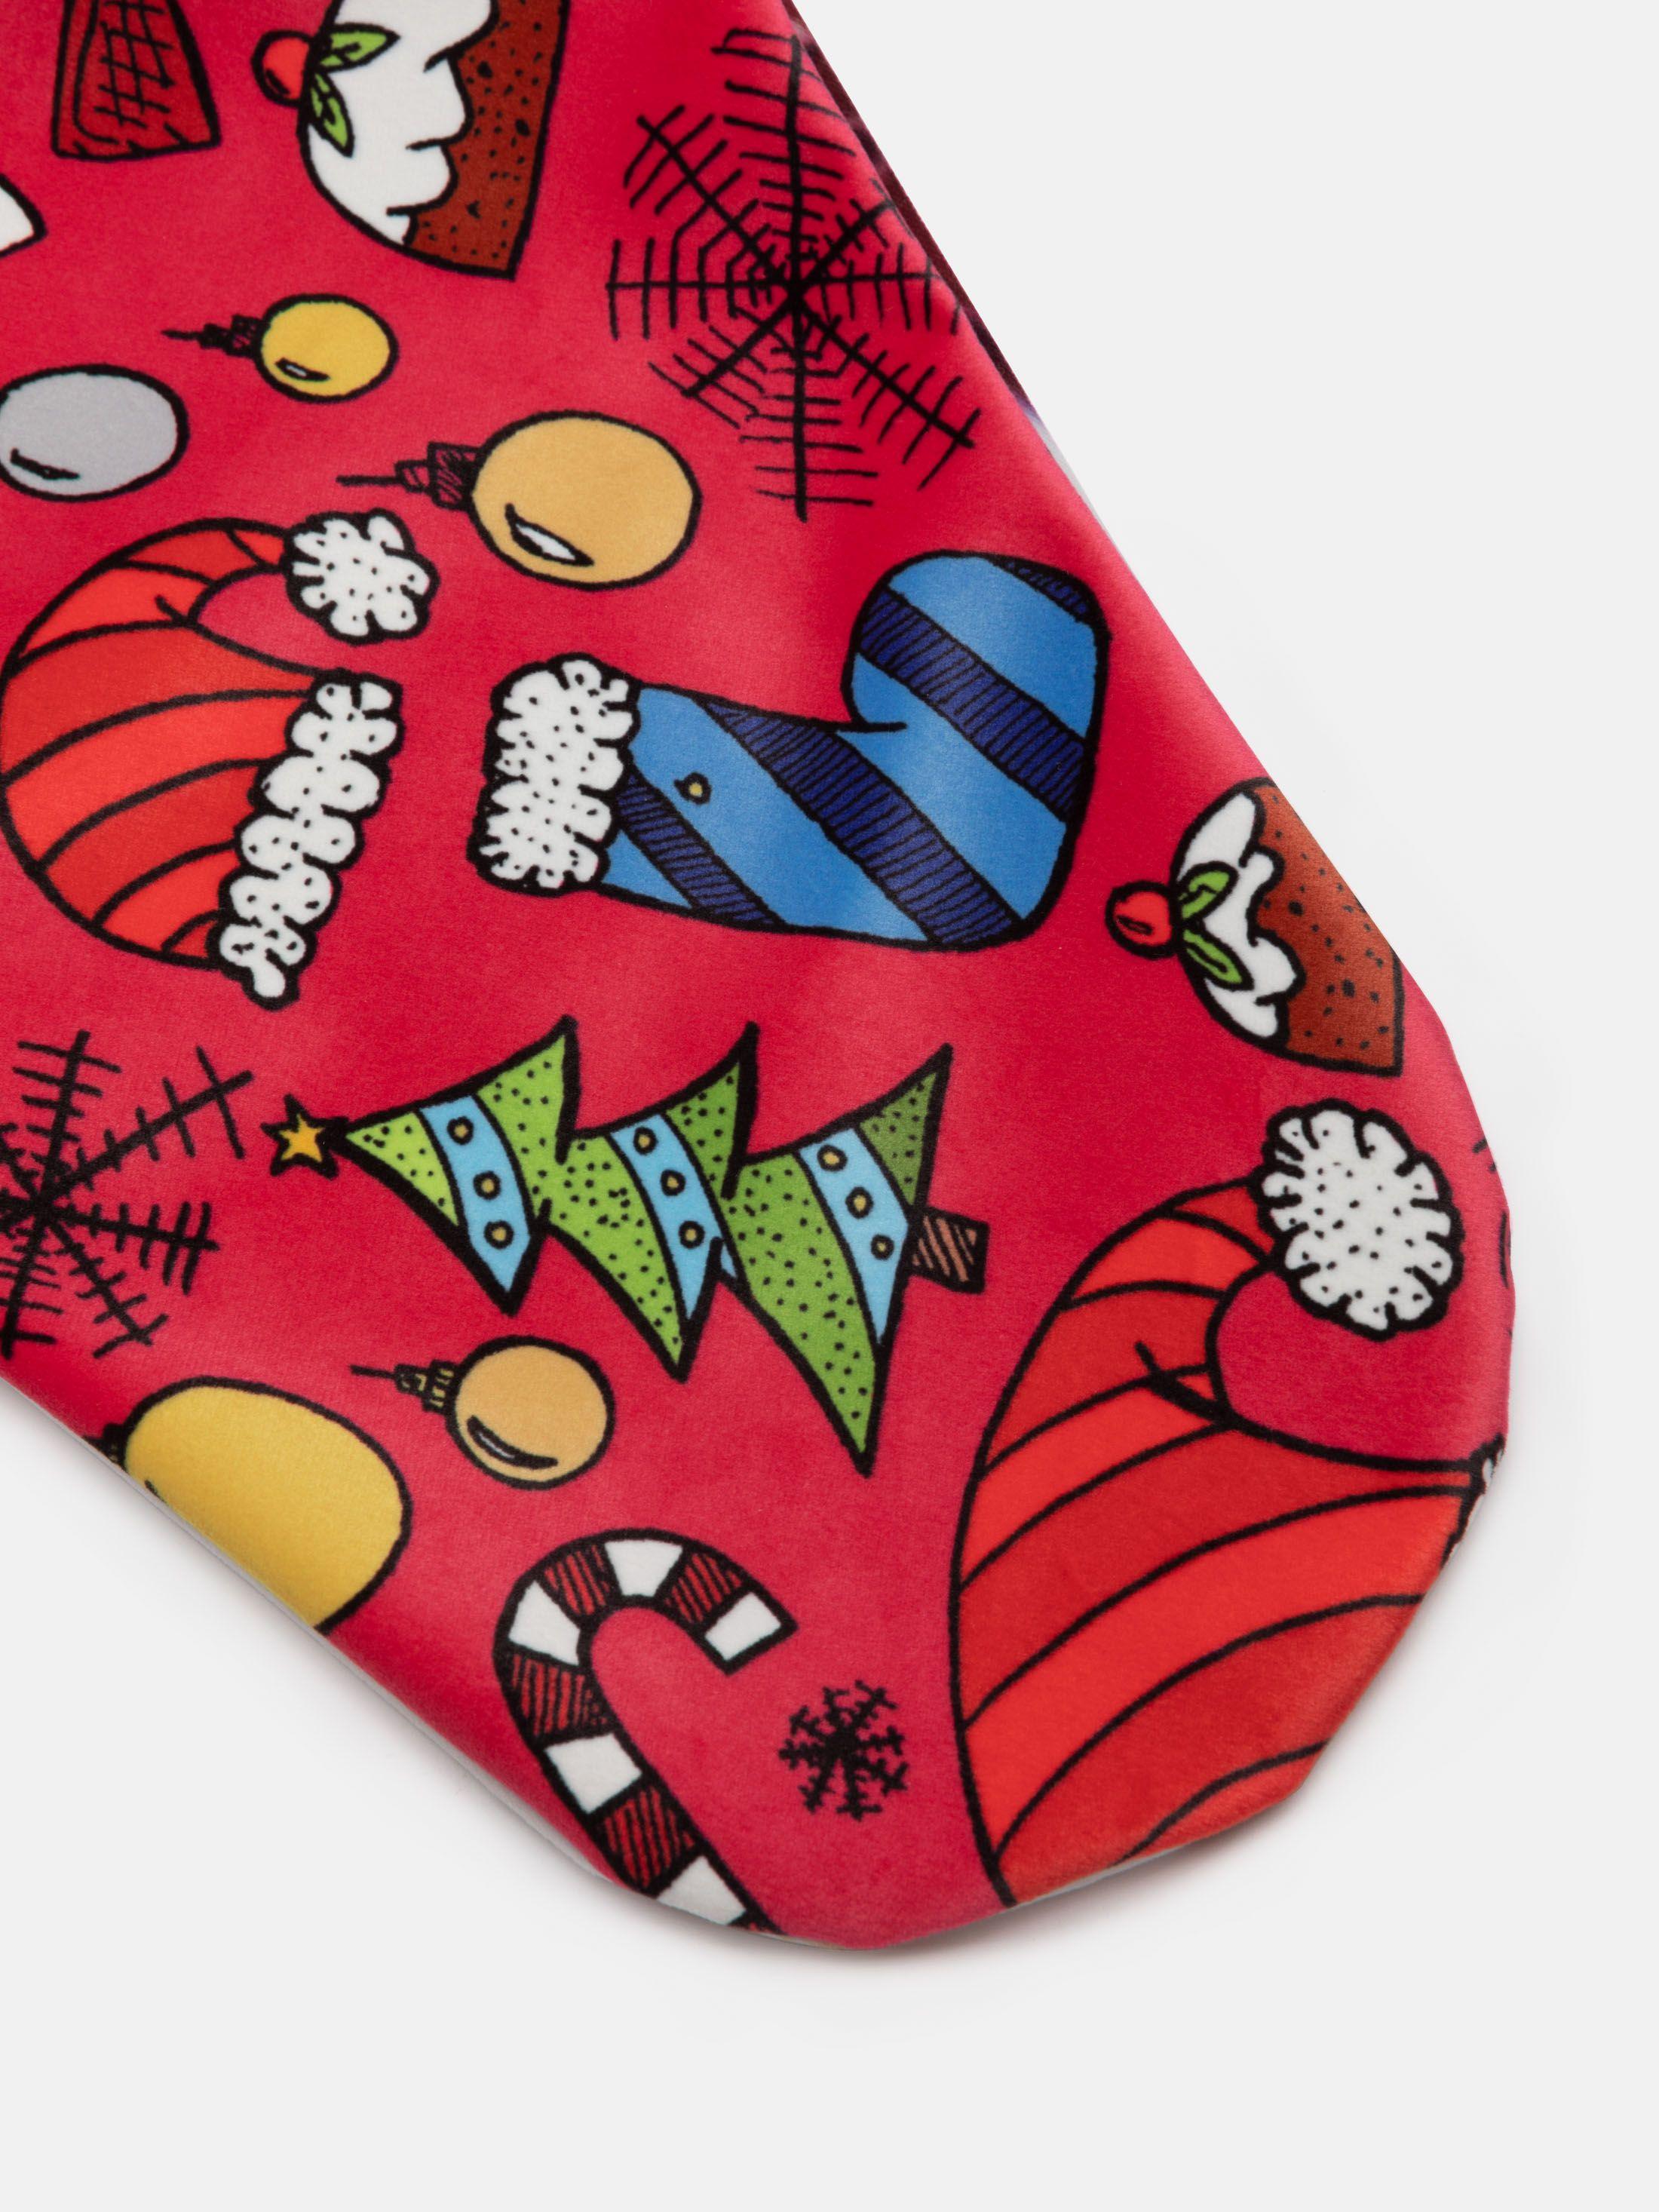 Custom Printed Stockings